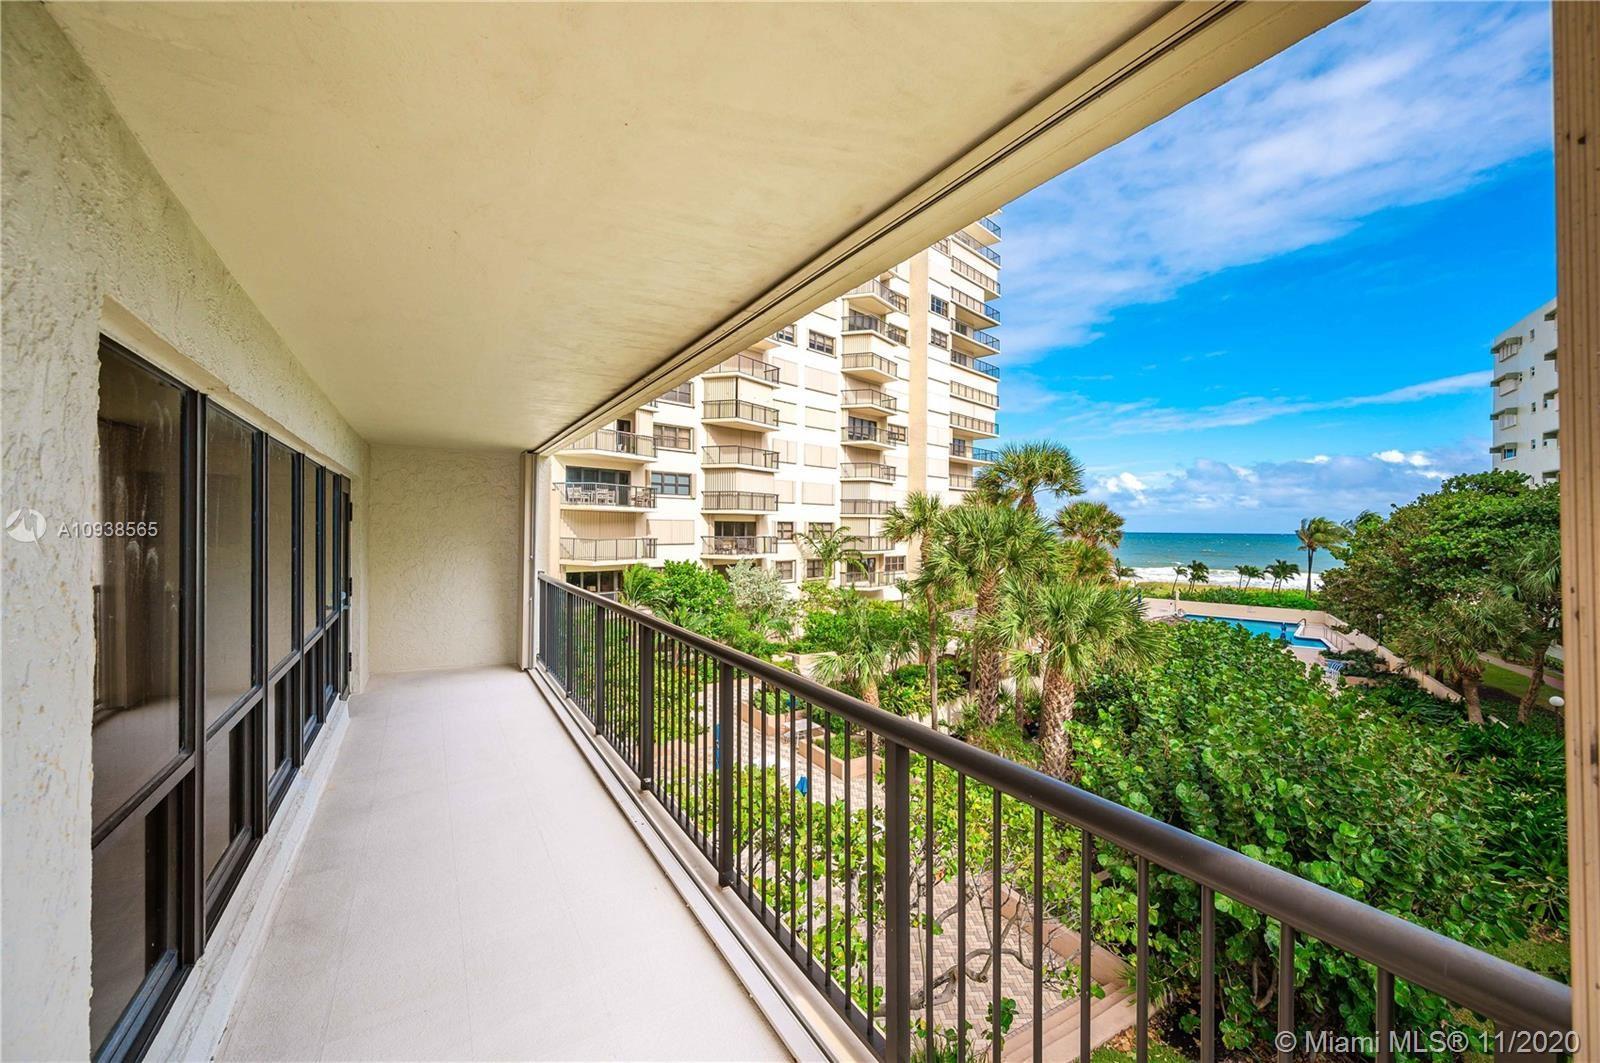 1800 S Ocean Blvd #307, Lauderdale by the Sea, FL 33062 - #: A10938565